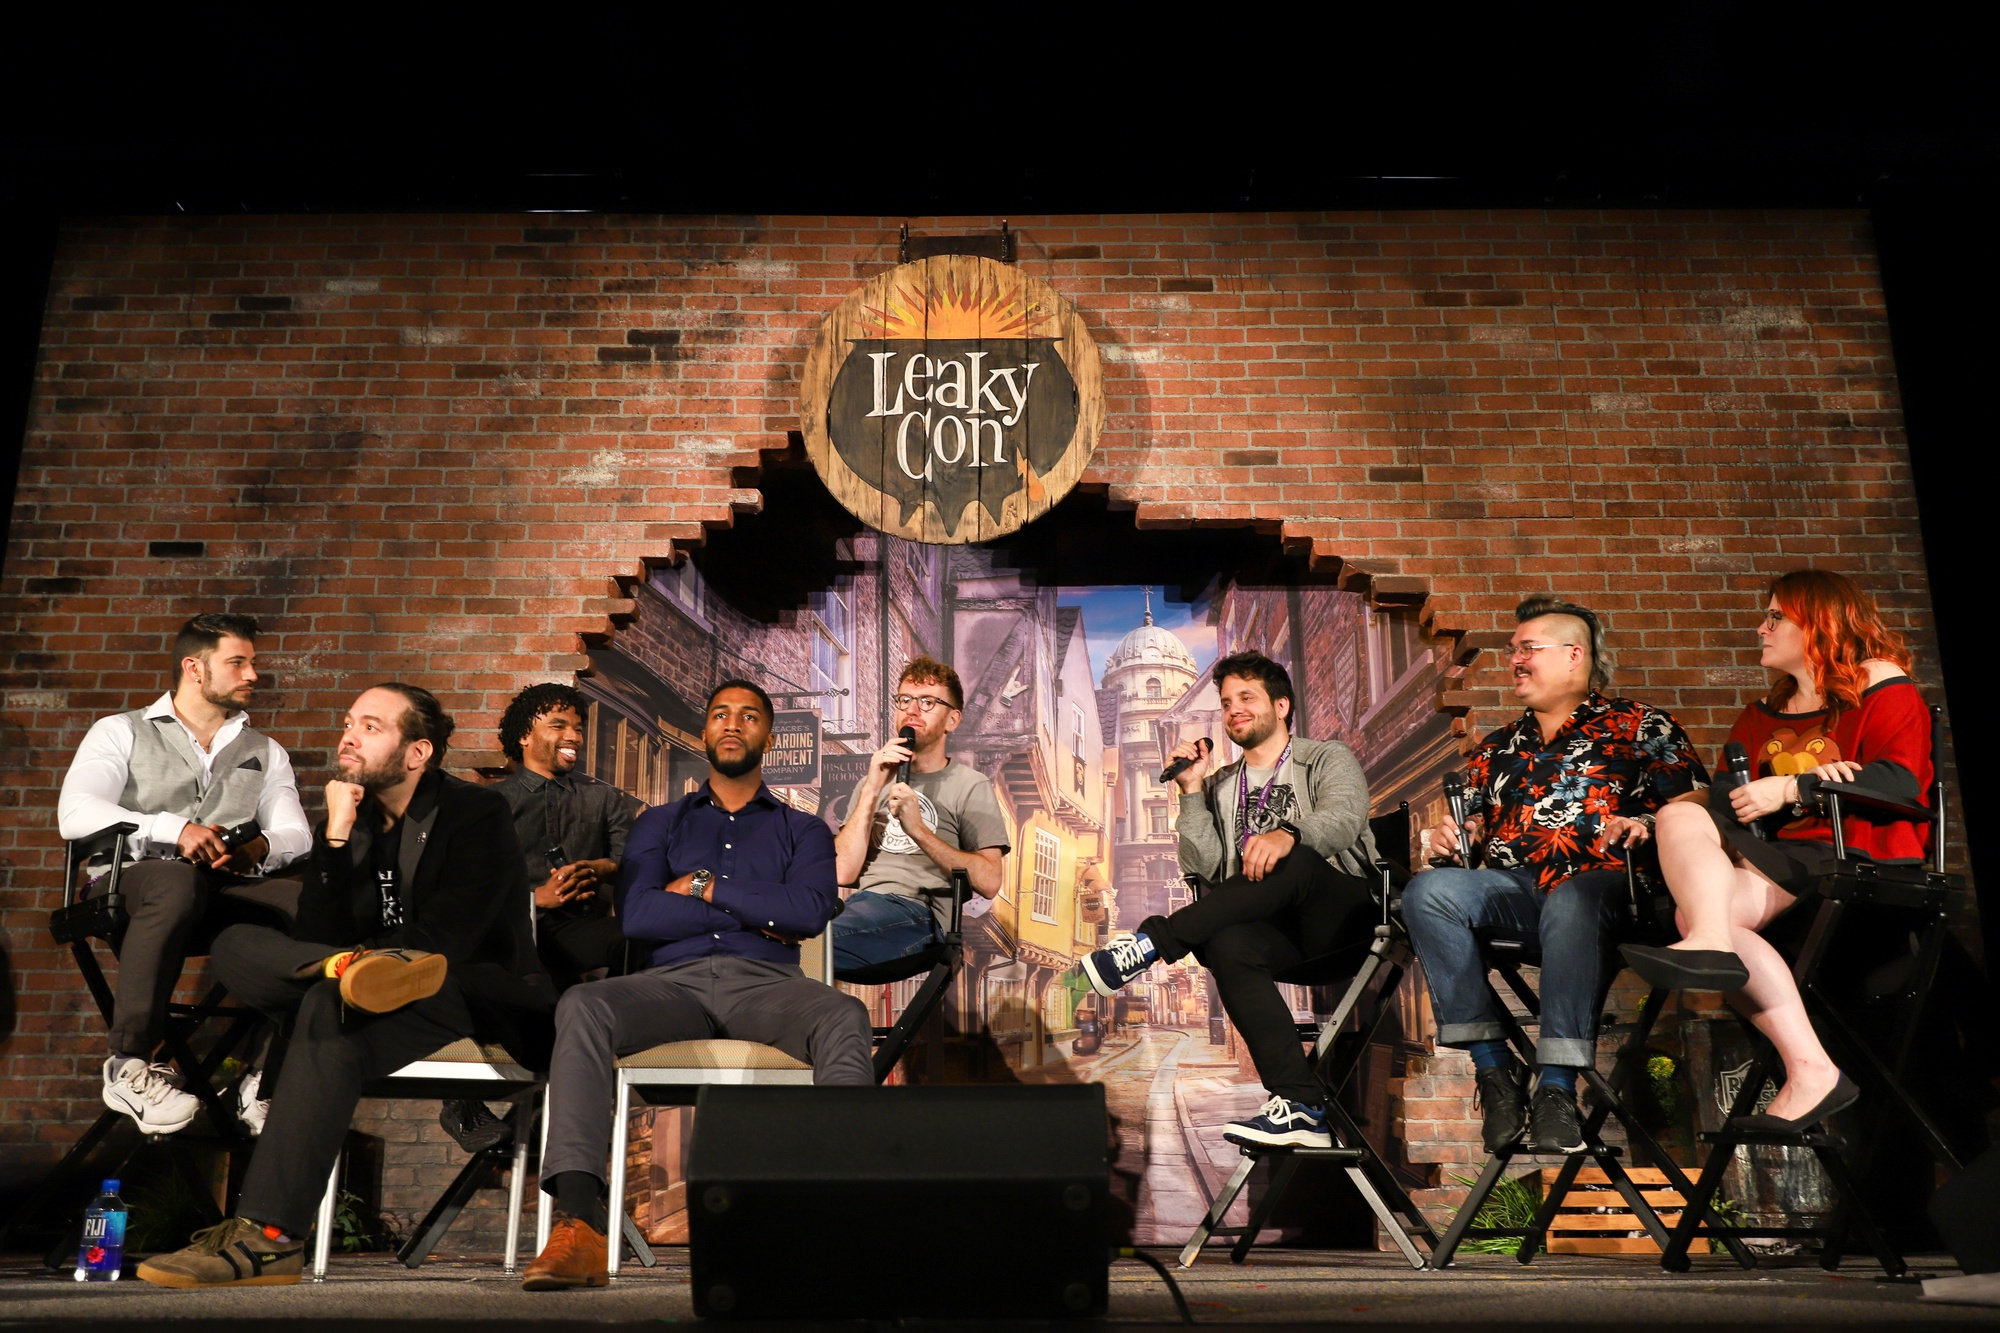 "Stanislav Yanevski (""Victor Krum""), Dan Fogler (""Jacob Kowalski""), Luke Youngblood (""Lee Jordan""), Louis Cordite (""Blaise Zabini""), and Chris Rankin (""Percy Weasley"") sit on a panel reminiscing fondly about behind the scenes shenangians of the Harry Potter film series."